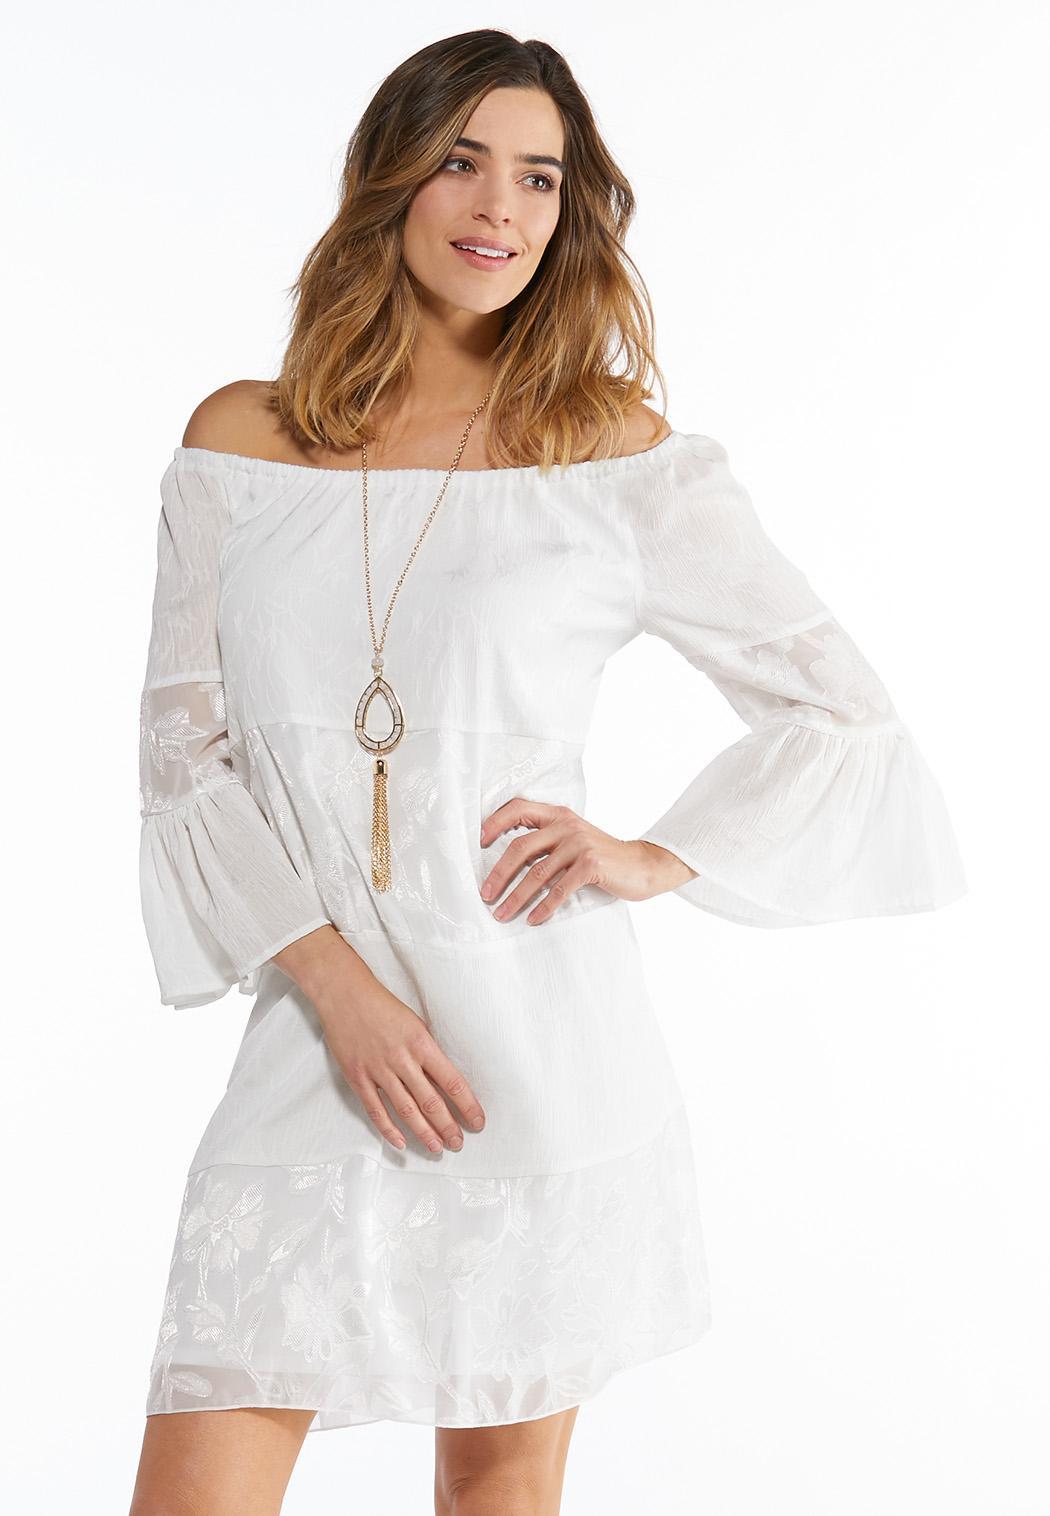 89b4ceebae6 Plus Size White Peasant Dress A-line   Swing Cato Fashions